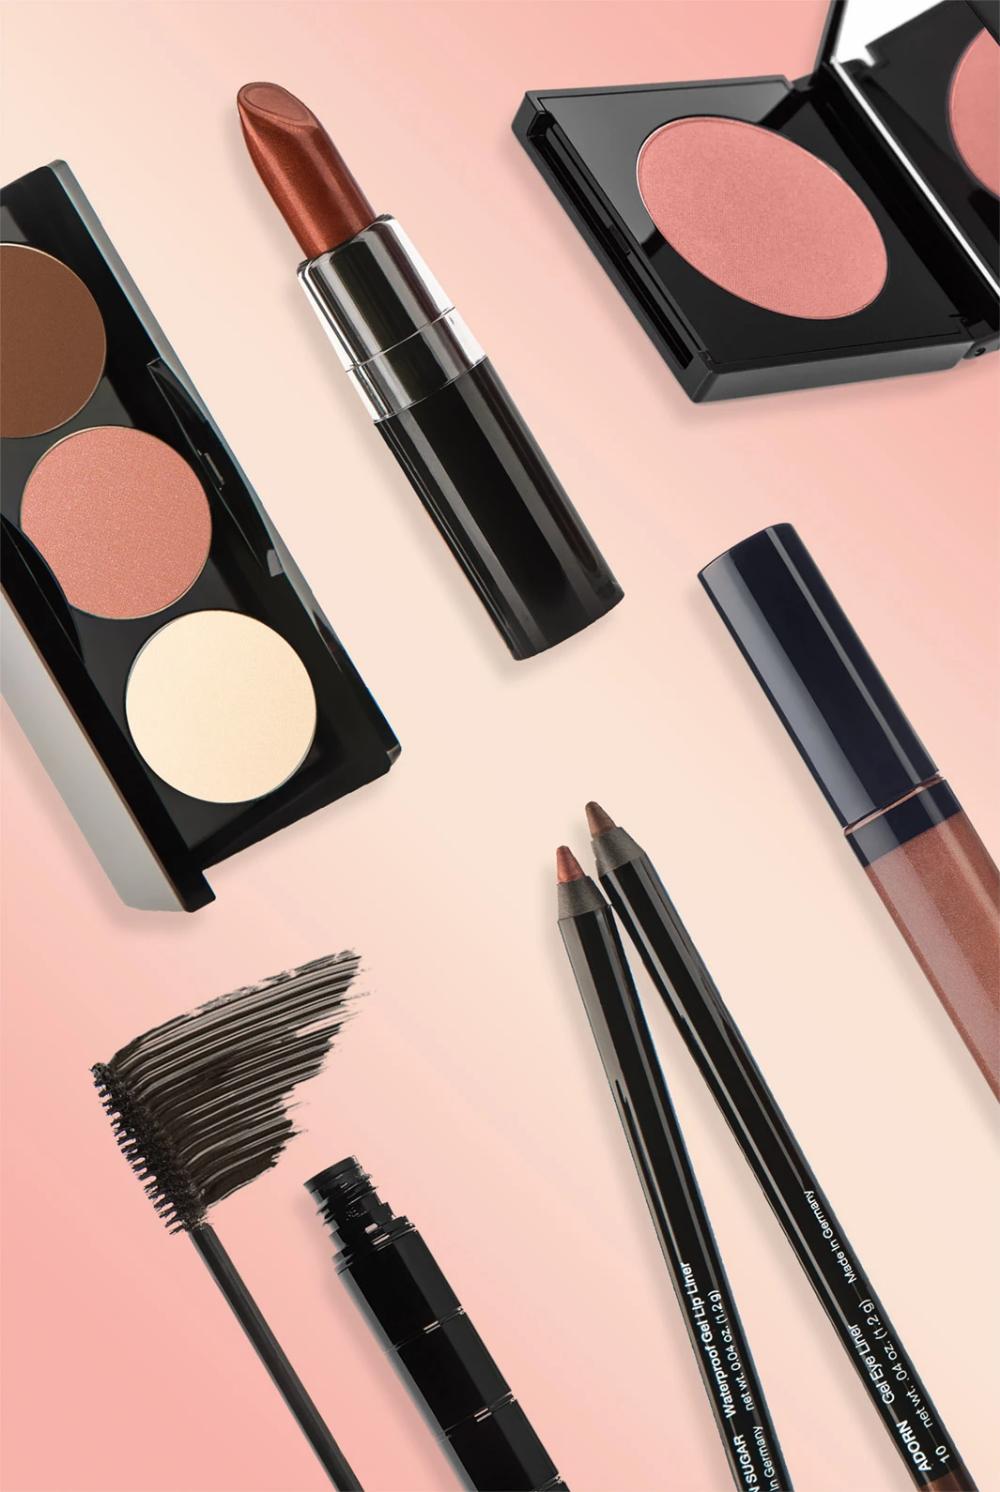 Type 3 Glam Up & Go Makeup Starter Kit in 2020 Makeup